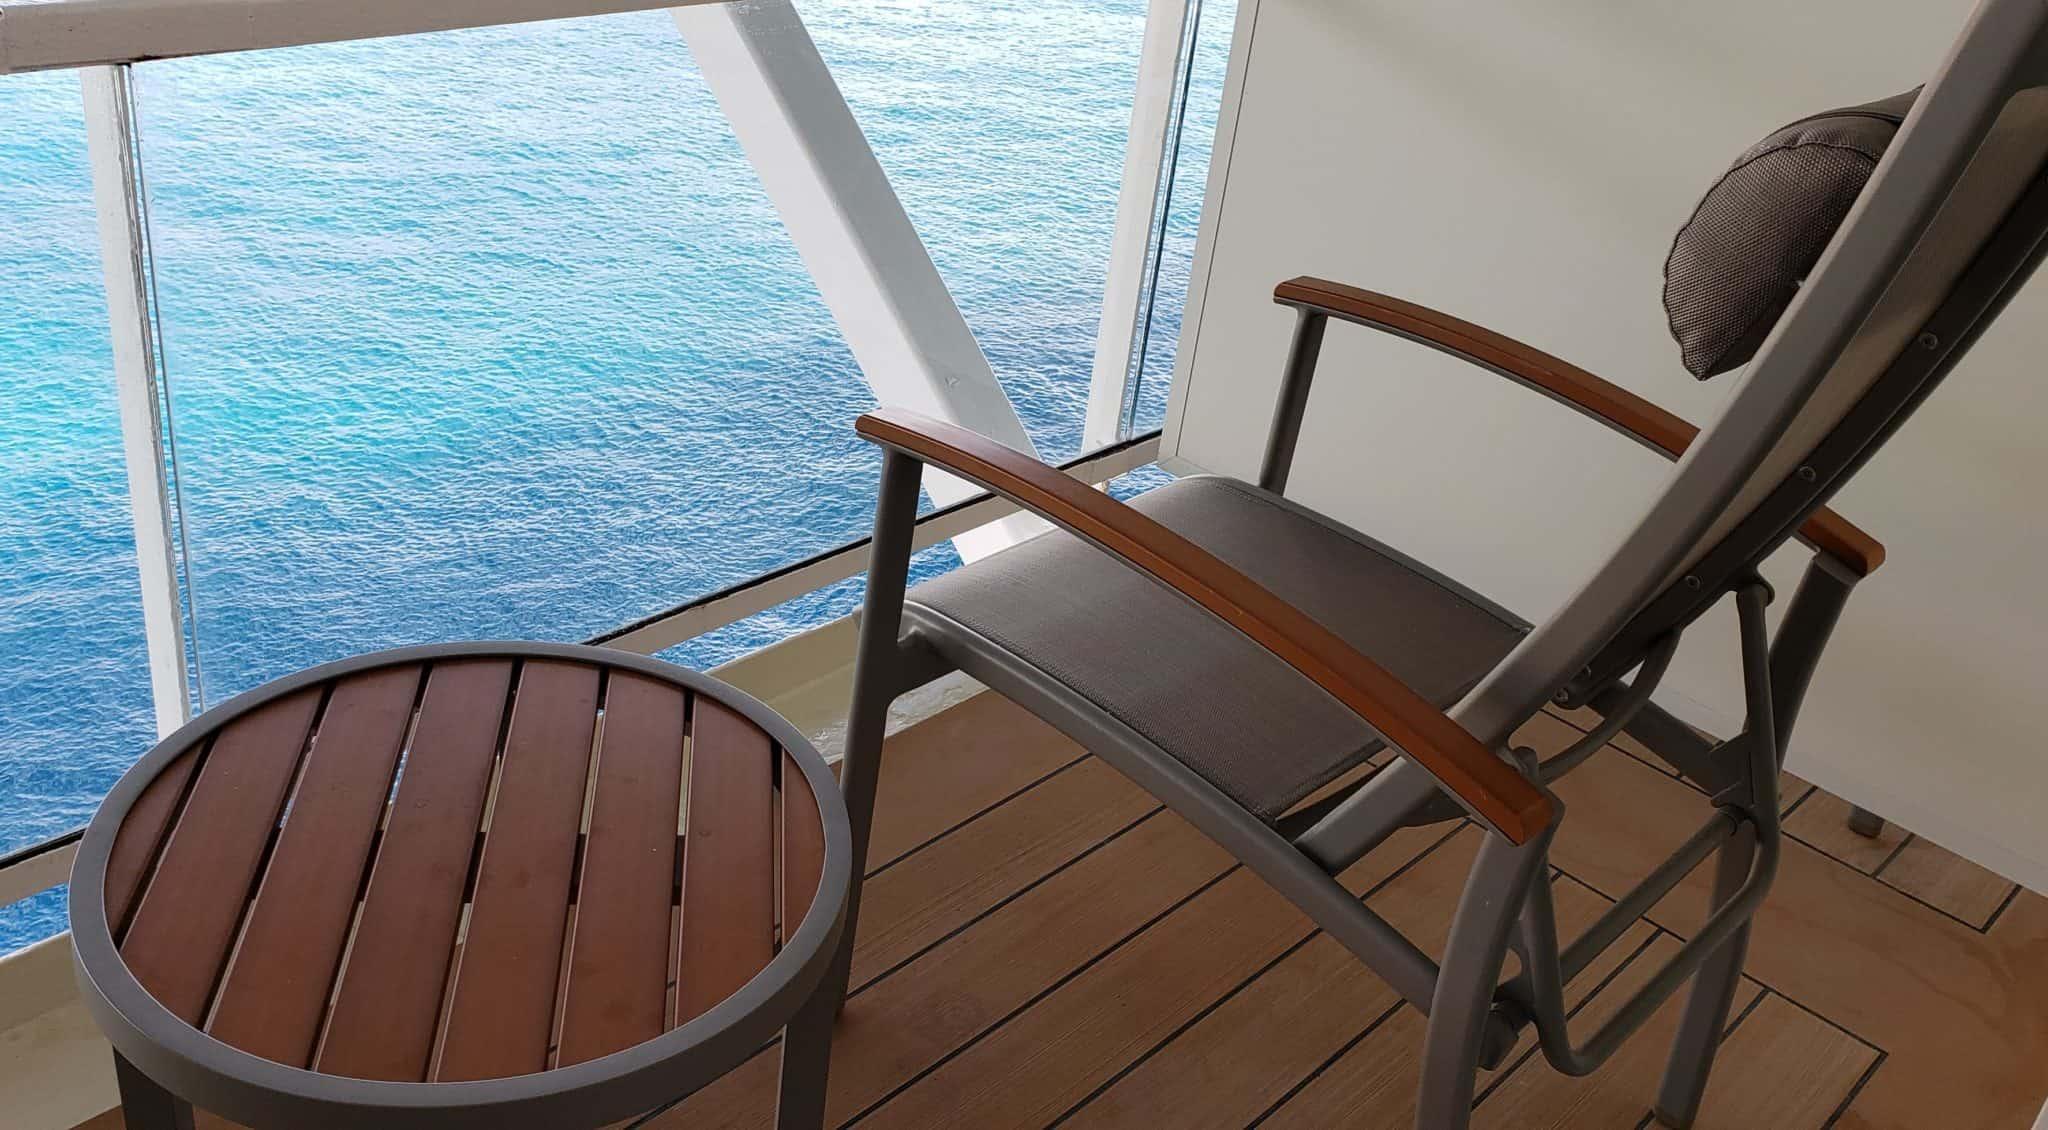 celebrity millennium aquaclass balcony cabin